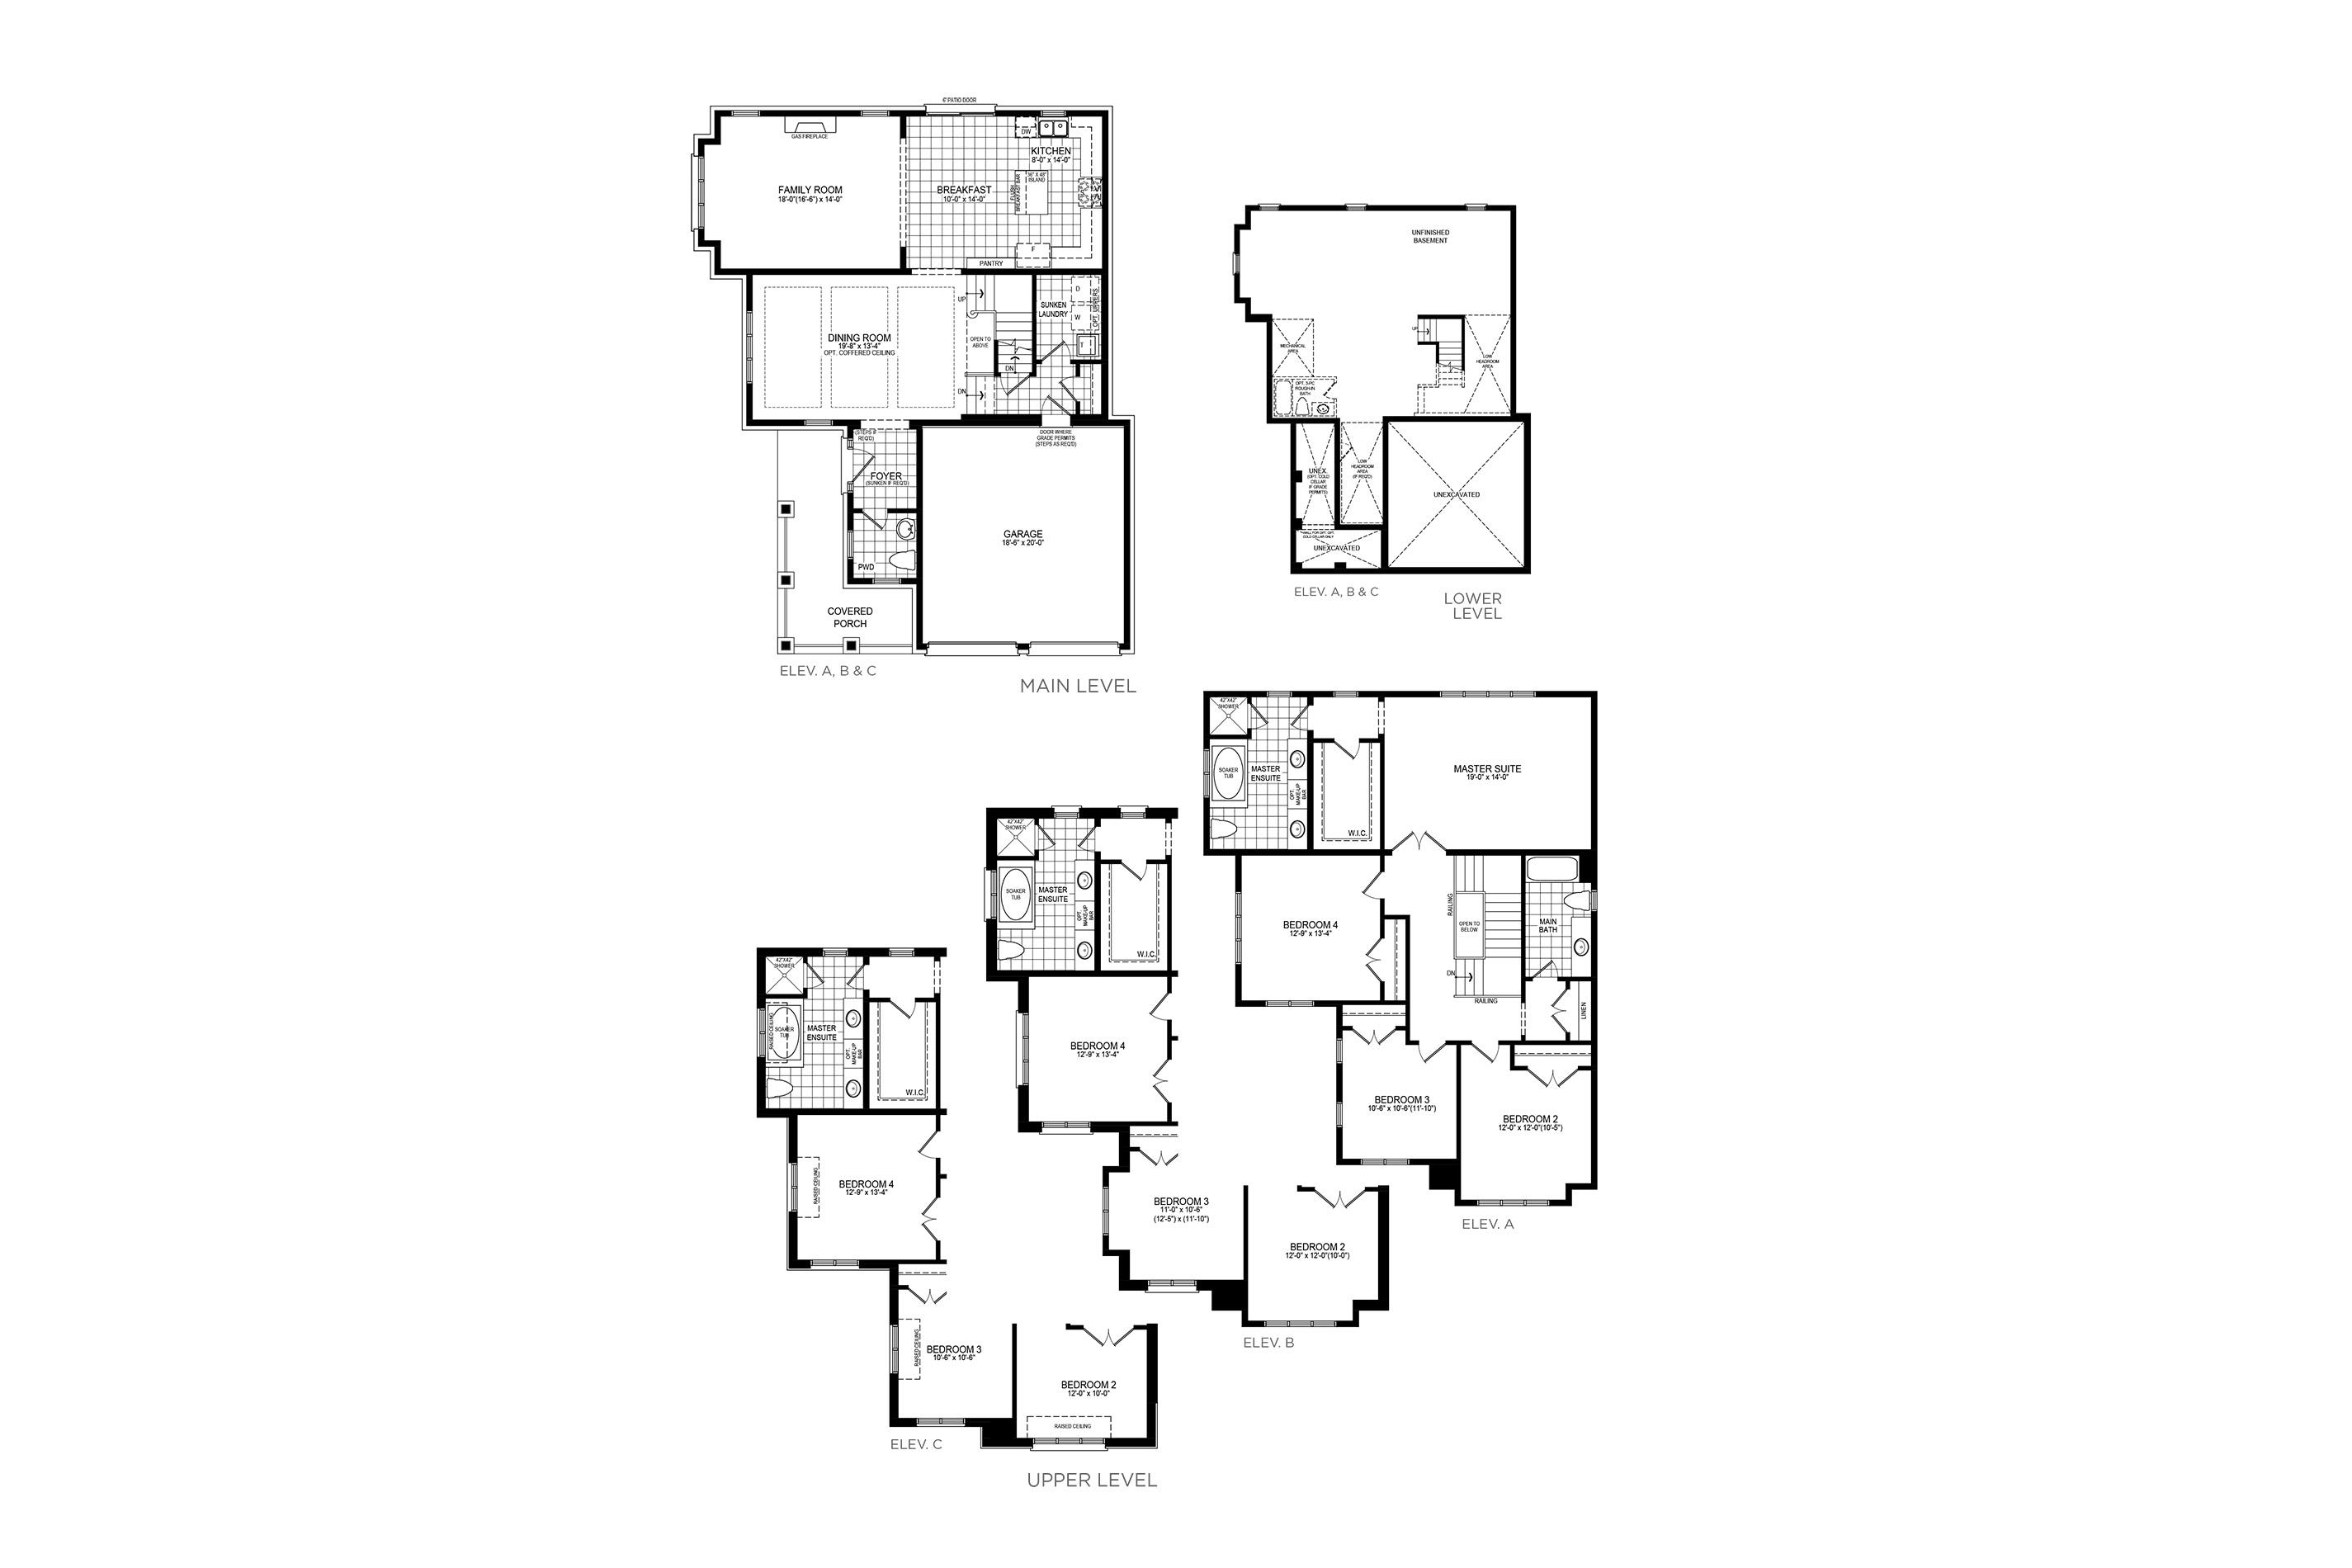 Kingsbury 13 Floorplan